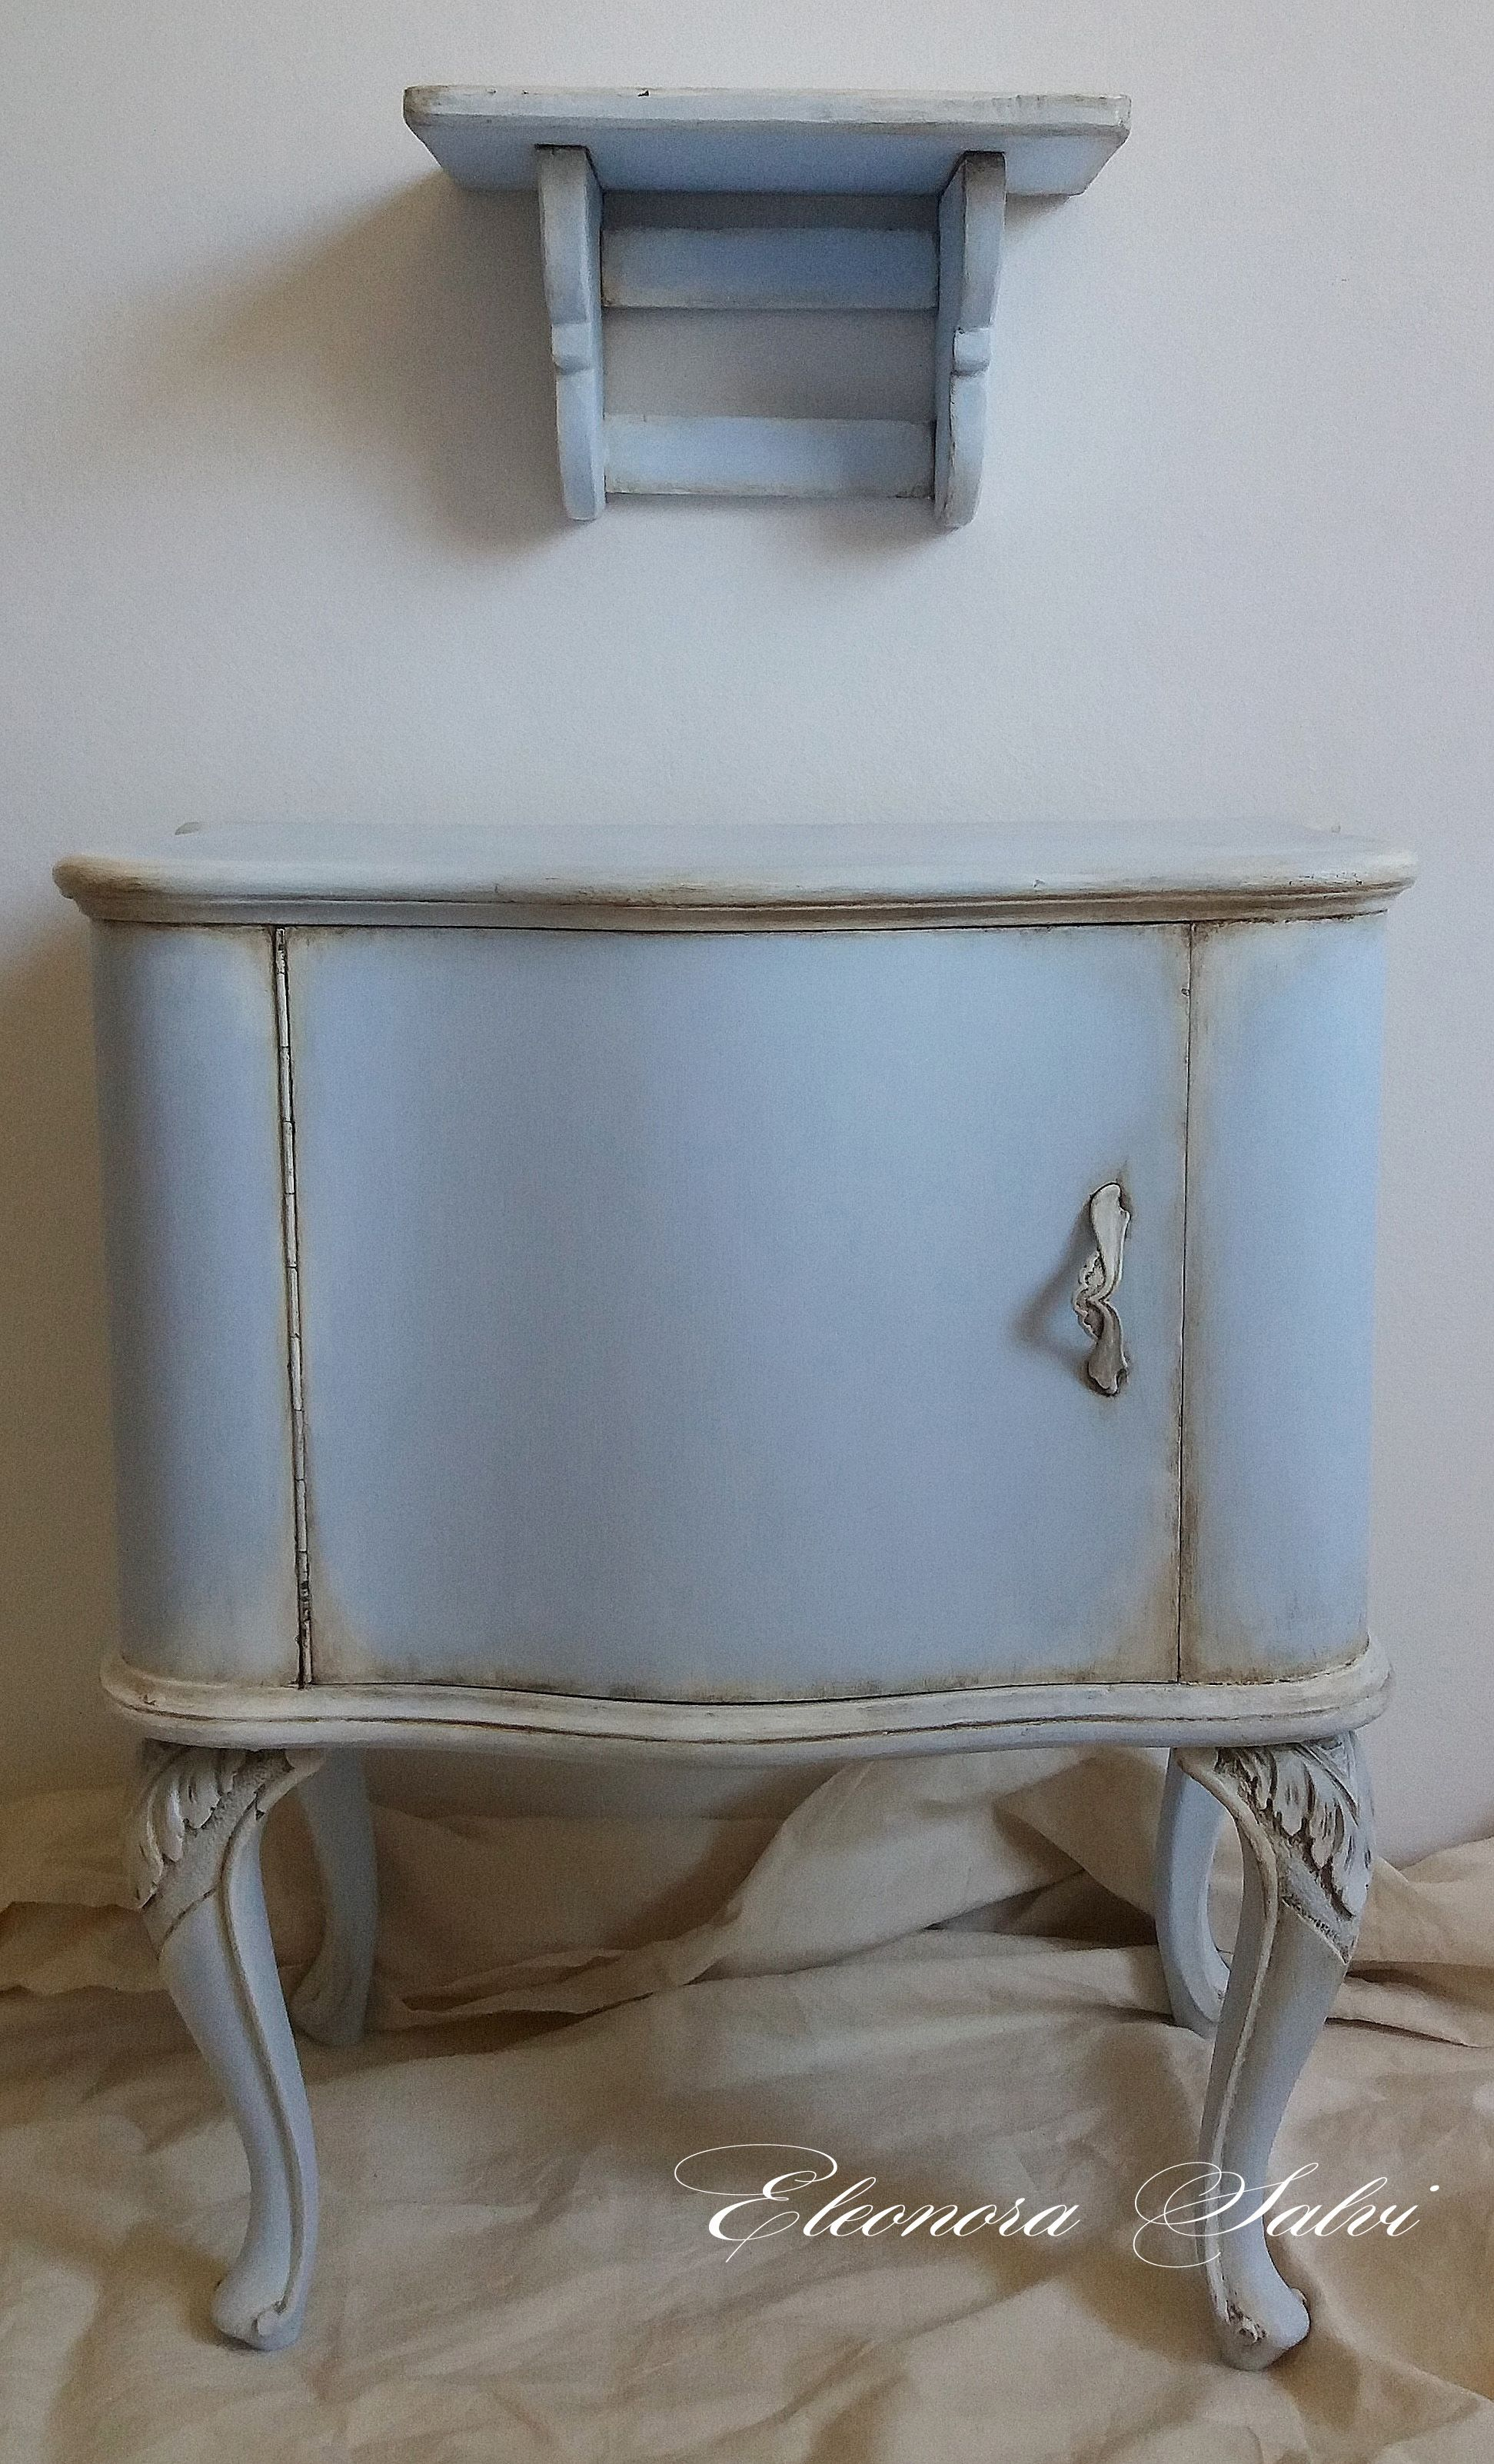 Comodini Lella | Shabby | Pinterest | Shabby, Paint furniture and ...